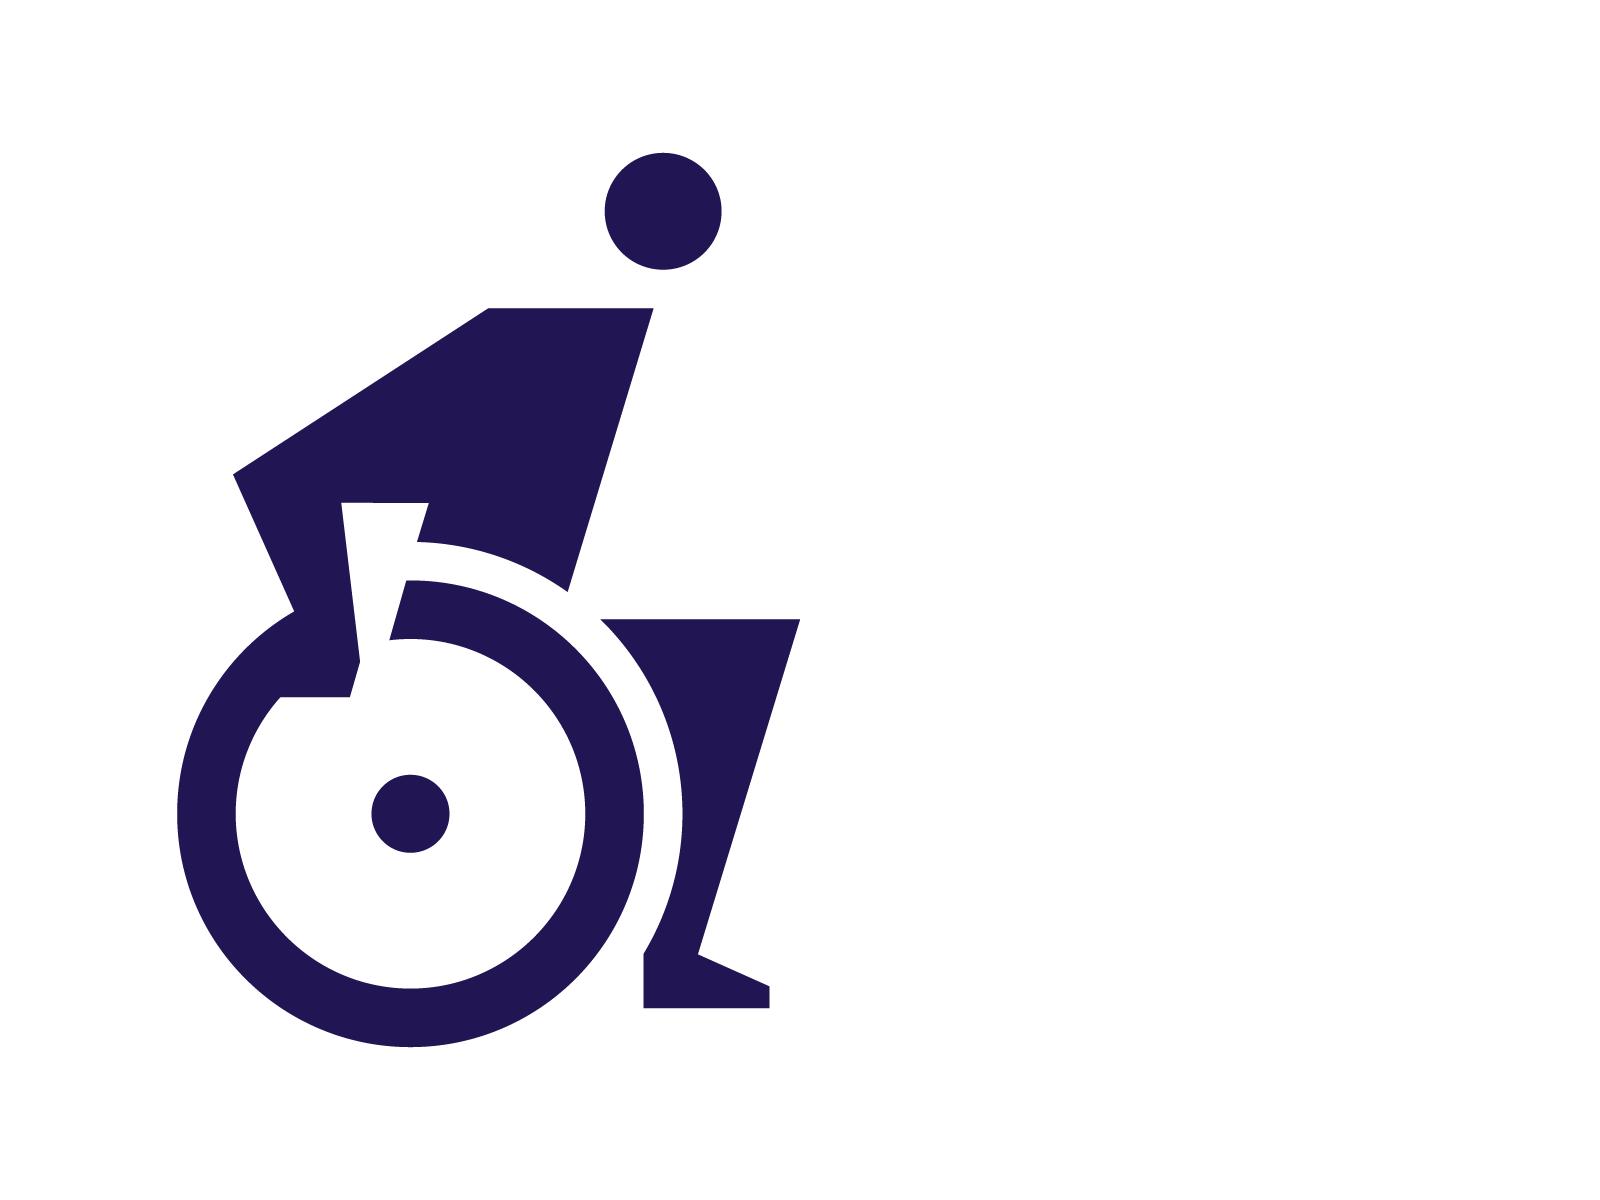 Disabled Picto Trendy Logo Design Logo Design Creative Pictogram